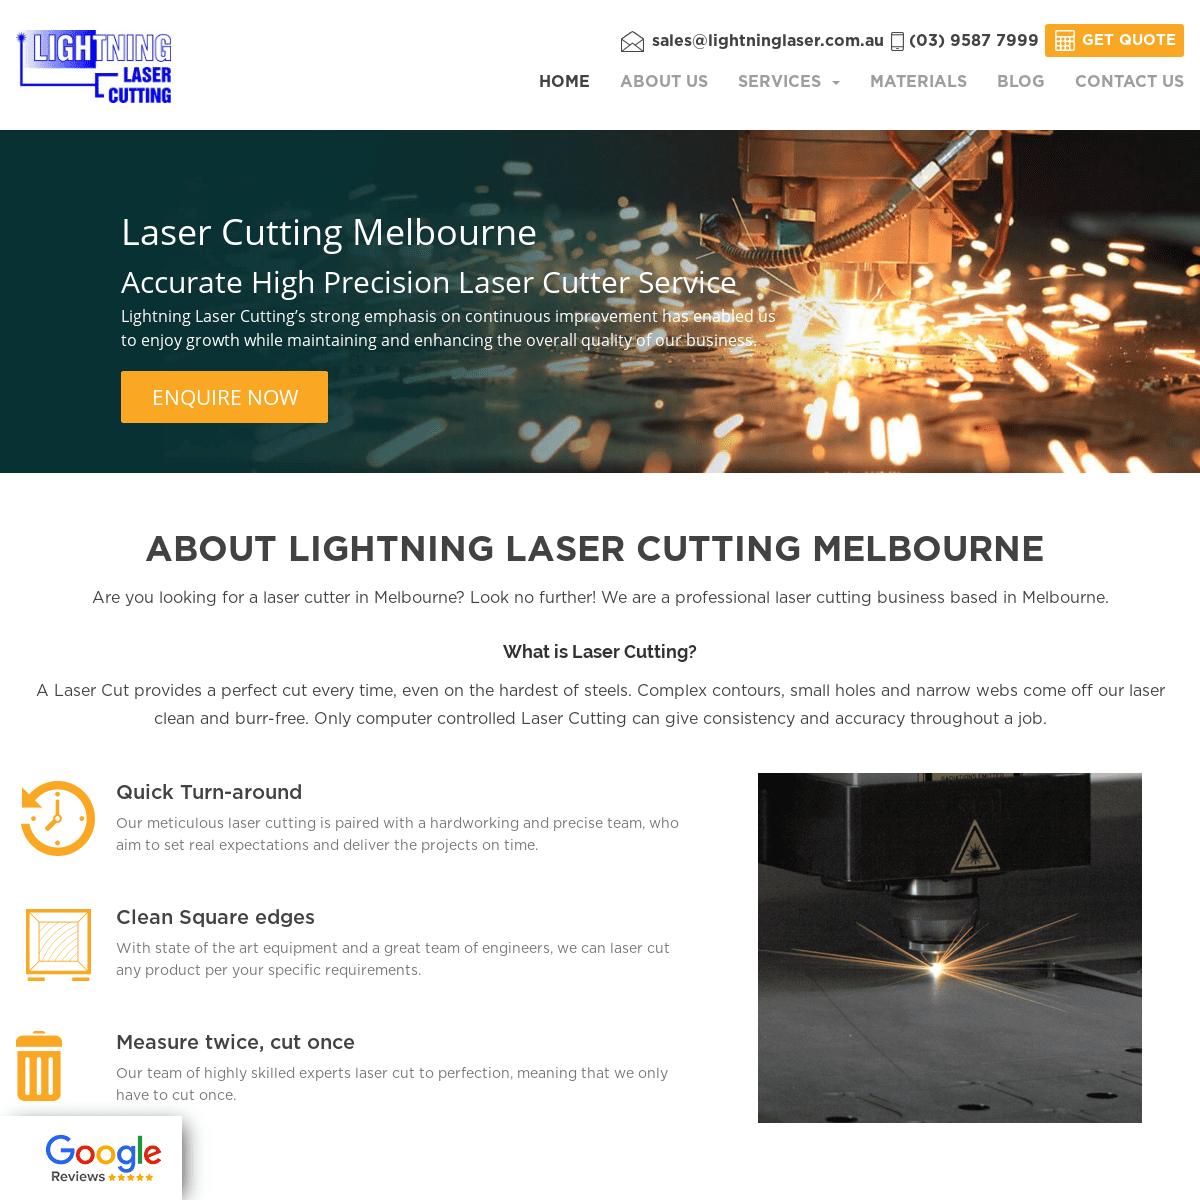 Laser Cutting Melbourne - Lighting Laser Cutting